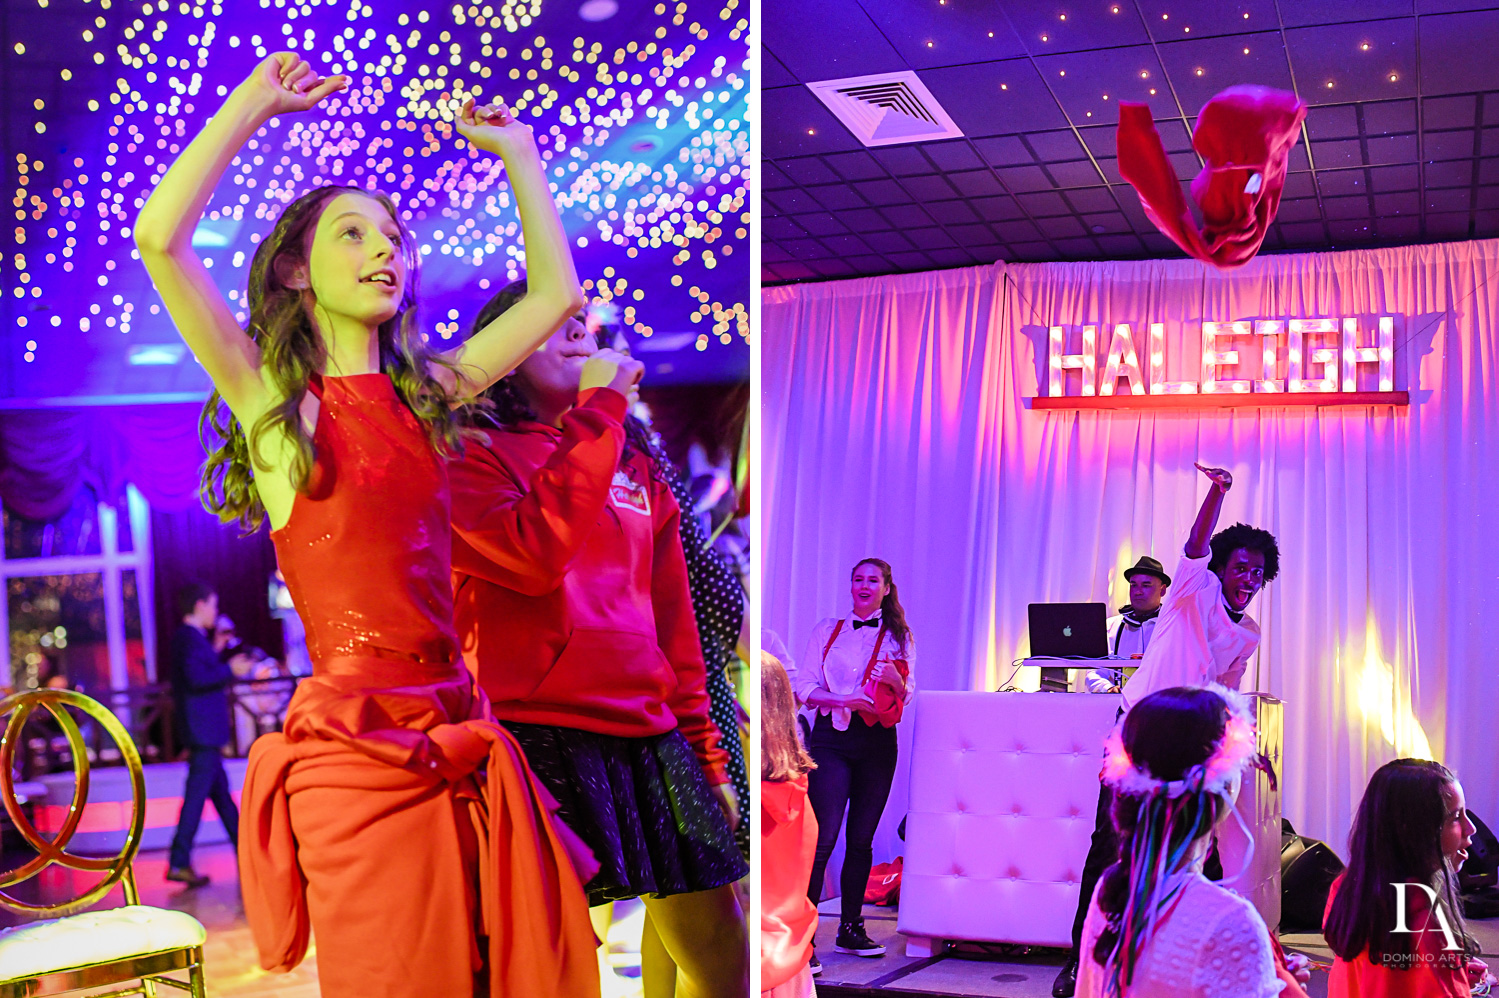 Fun and party favors at Broadway Theme Bat Mitzvah Photography at Miami Beach Resort